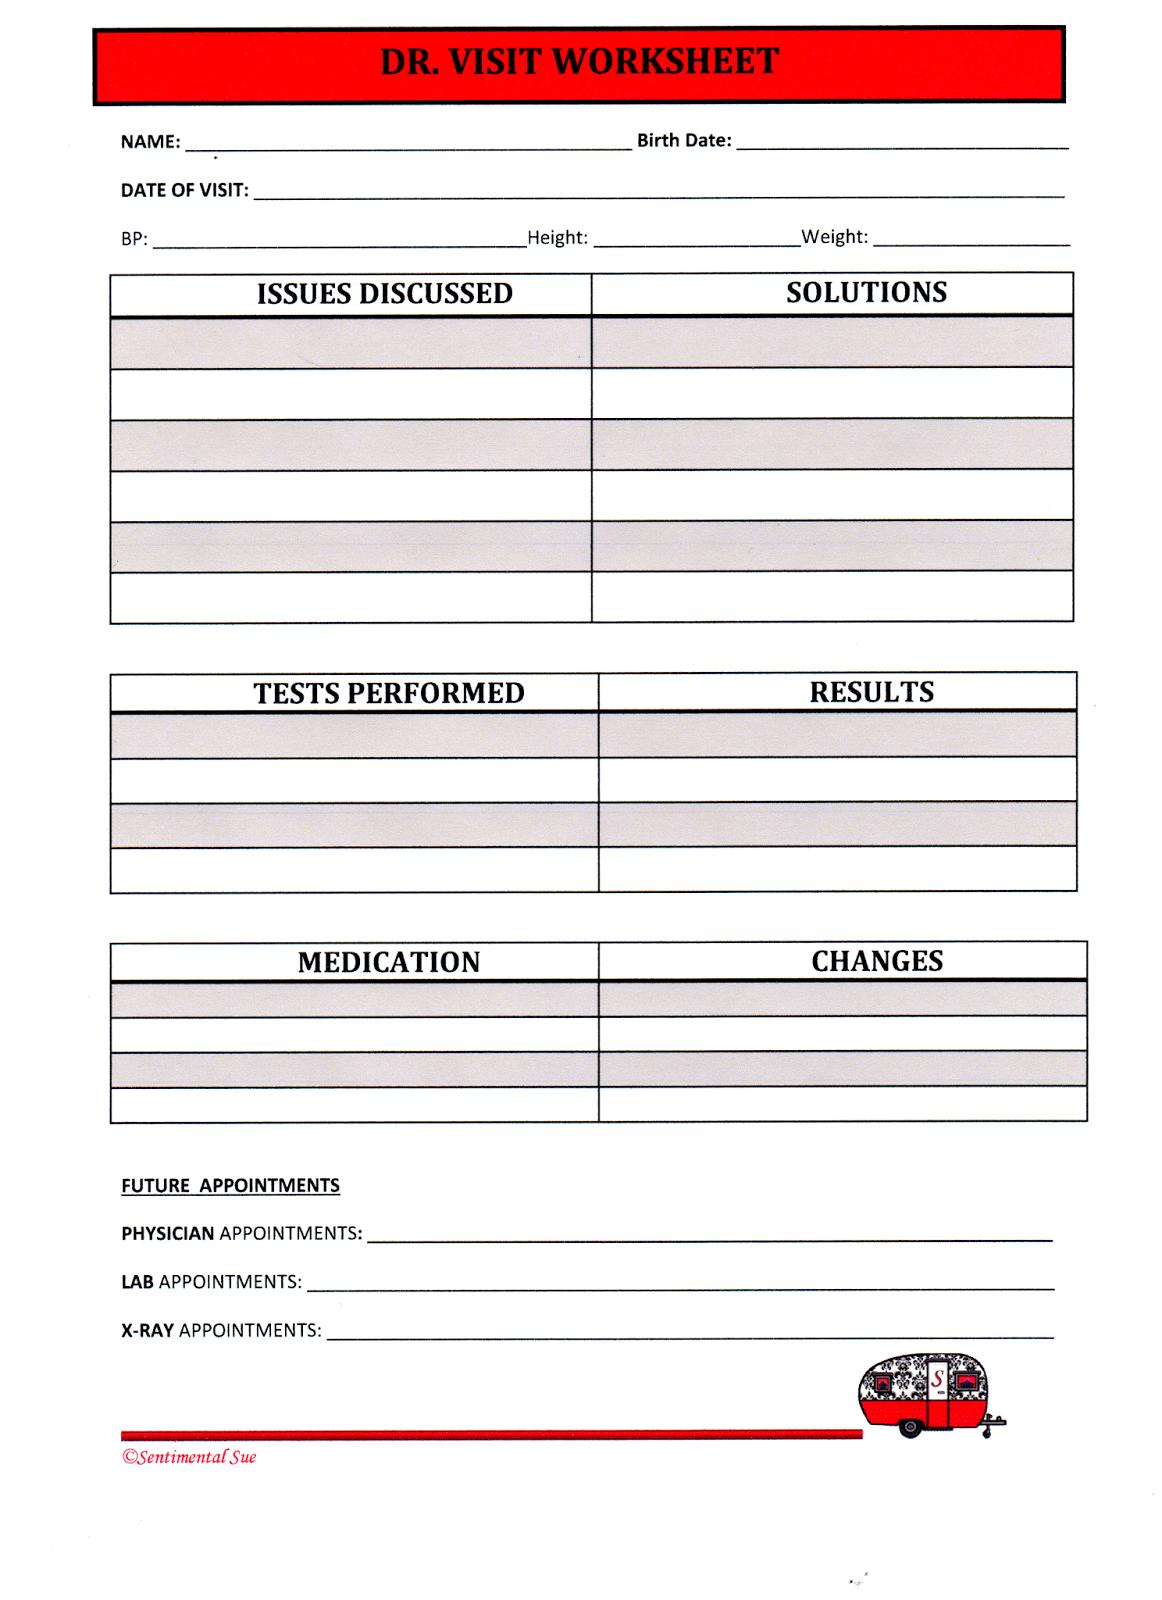 Sentimental Sue Workamper Worksheets